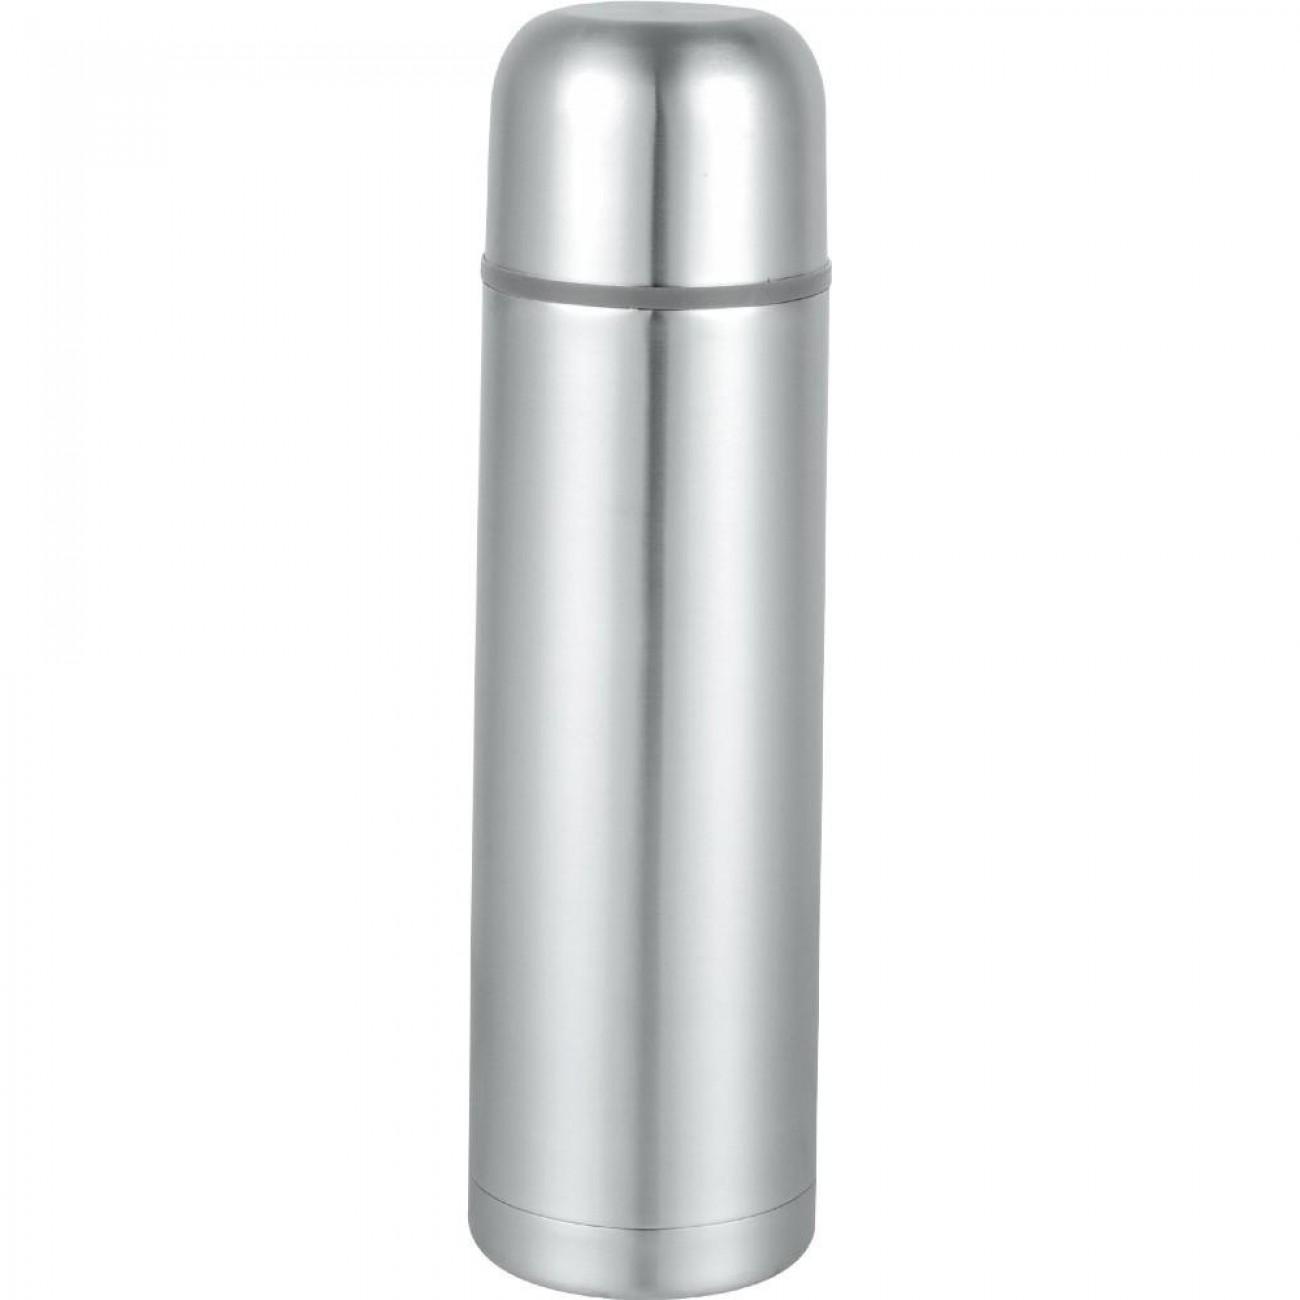 Термос SAPIR SP 2010 B, 1 литър, Включена чантичка, Запушалка, Сребрист в Термоси и термо чаши - SAPIR | Alleop